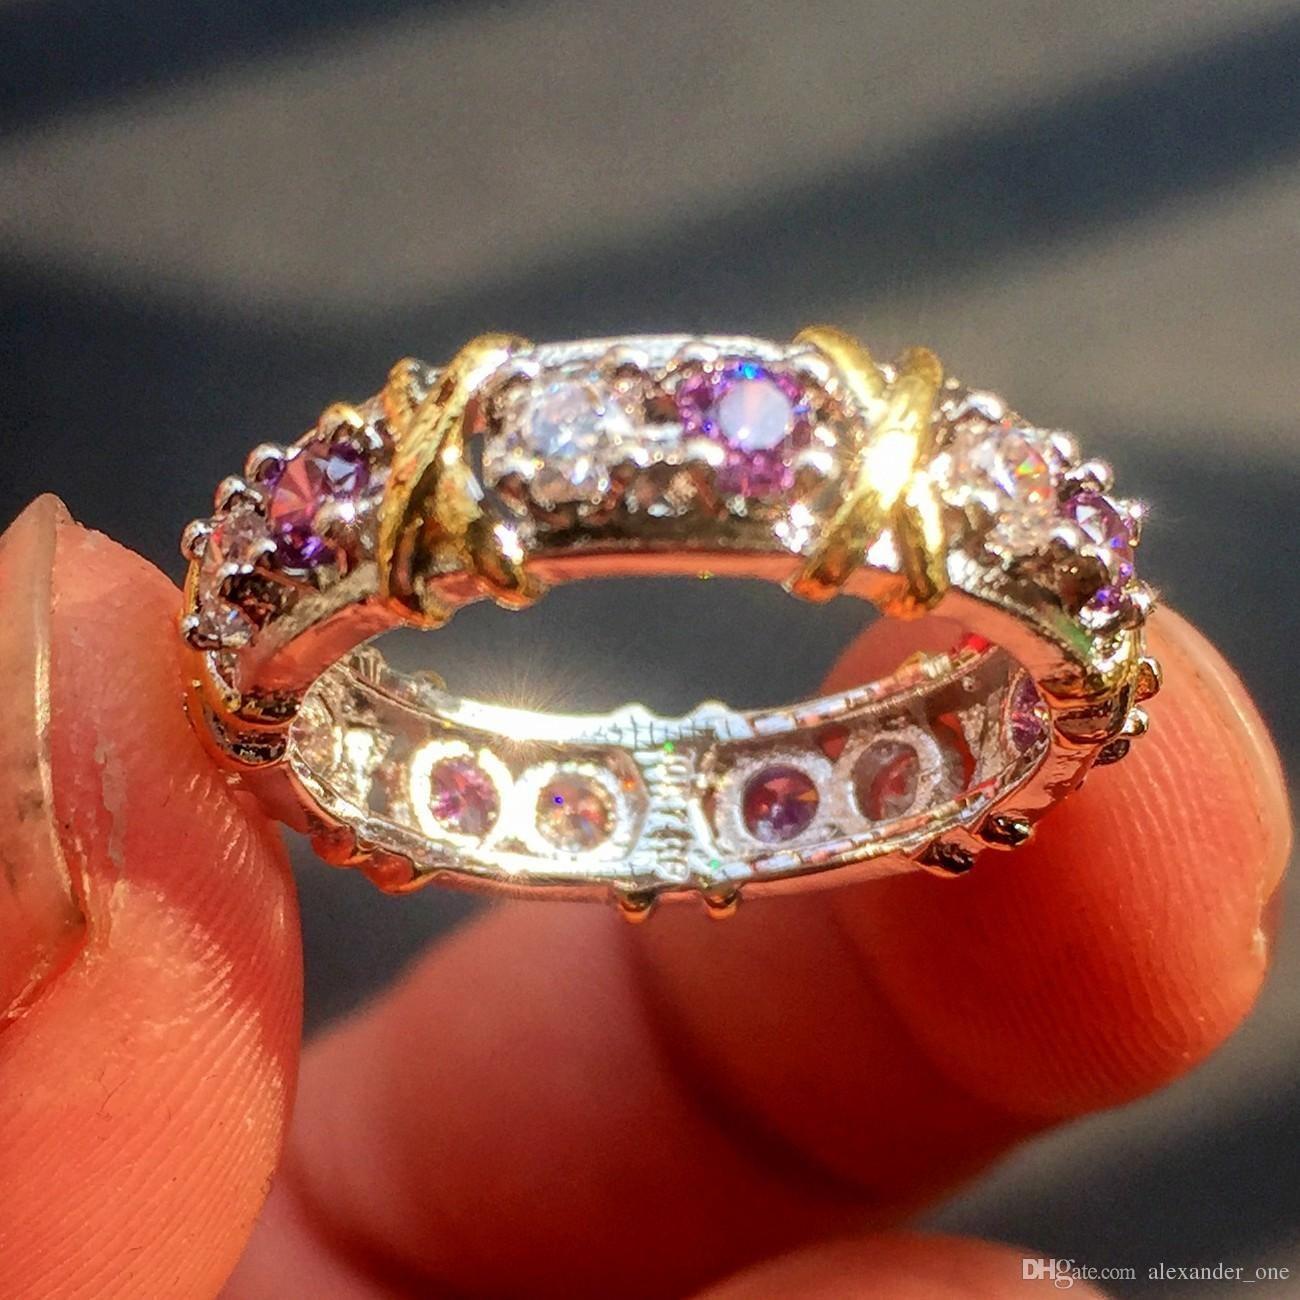 4abadd1f9d22 Compre Marca Jewlery Mujeres 925 Plata Púrpura Diamante Simulado Cubic  Zirconia Tanzanite Oro Amarillo Cruz Eterno Anillo De Bodas Banda A  14.08  Del ...